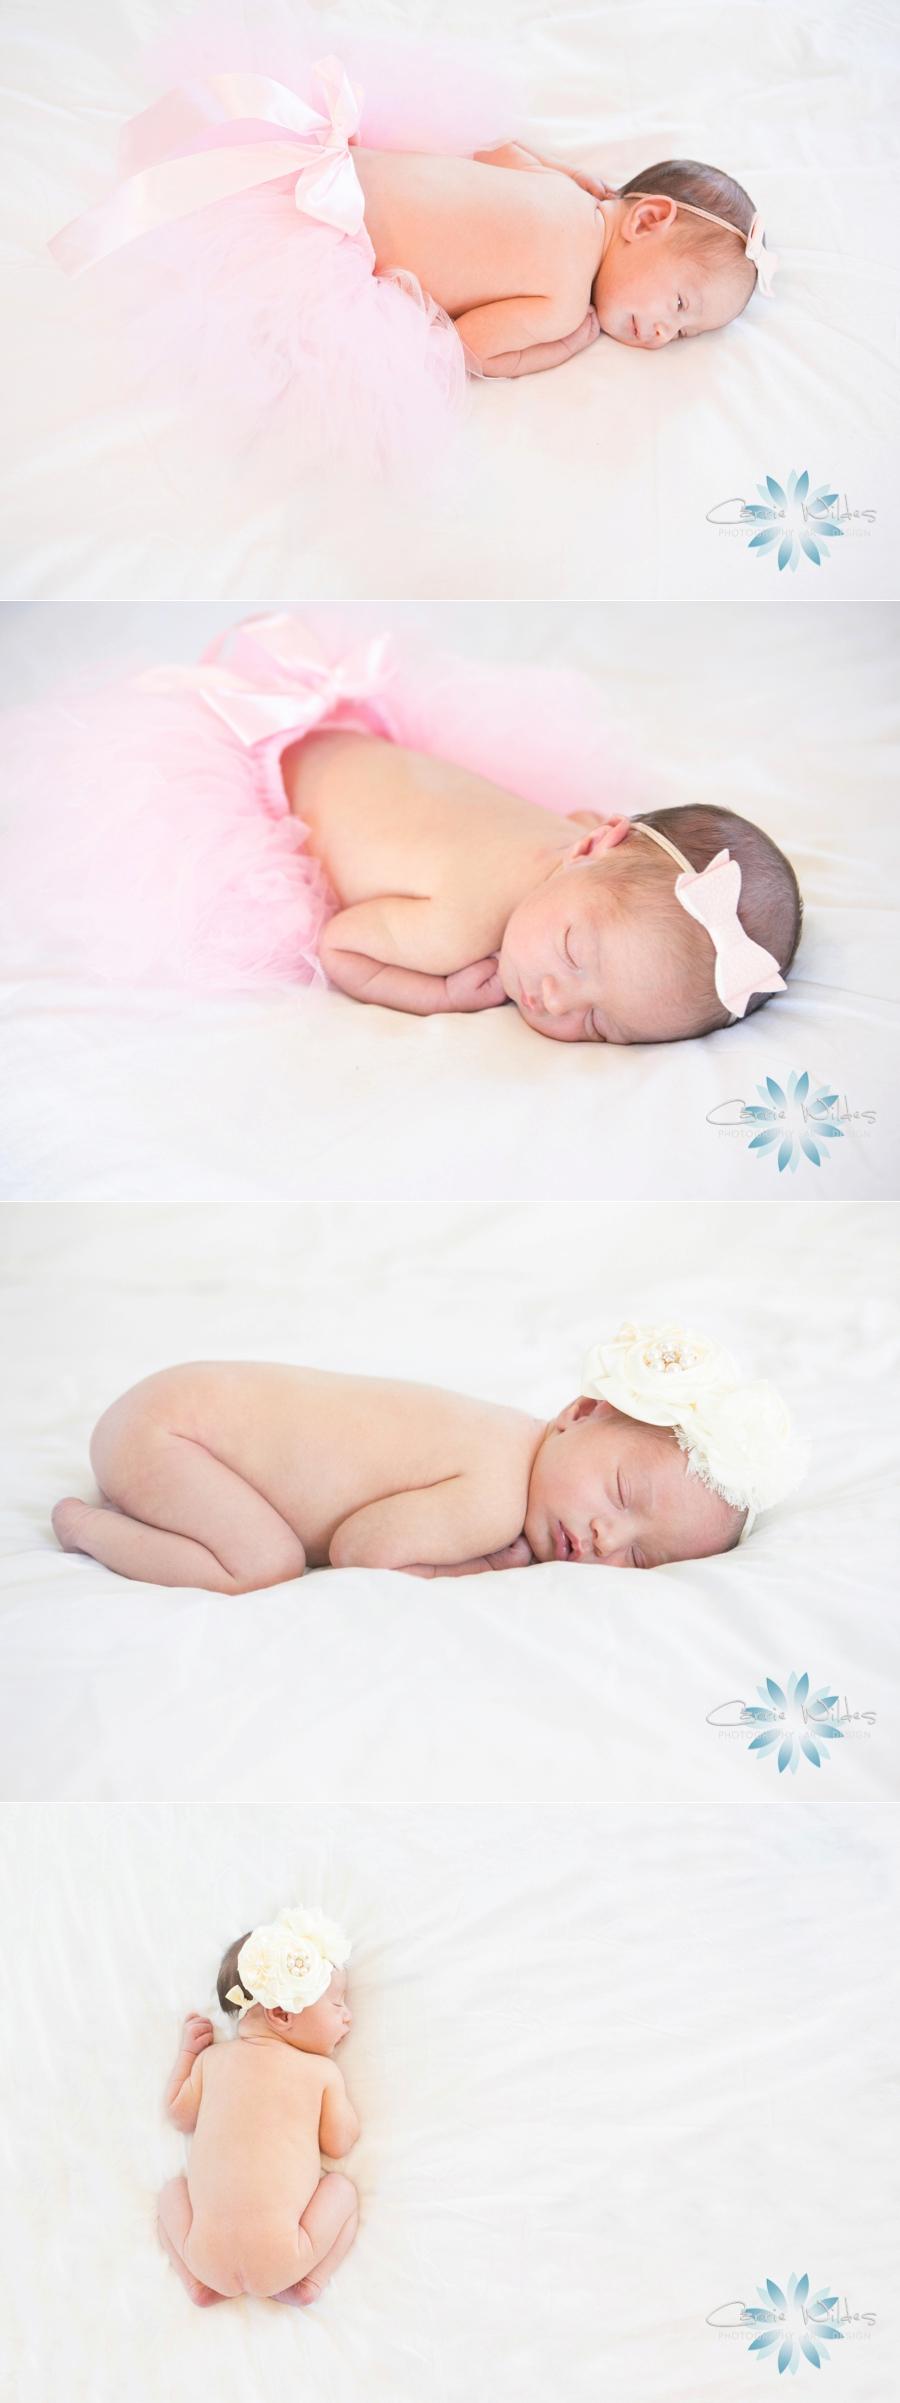 3_13_18 Lorelei Tampa Newborn Session_0013.jpg